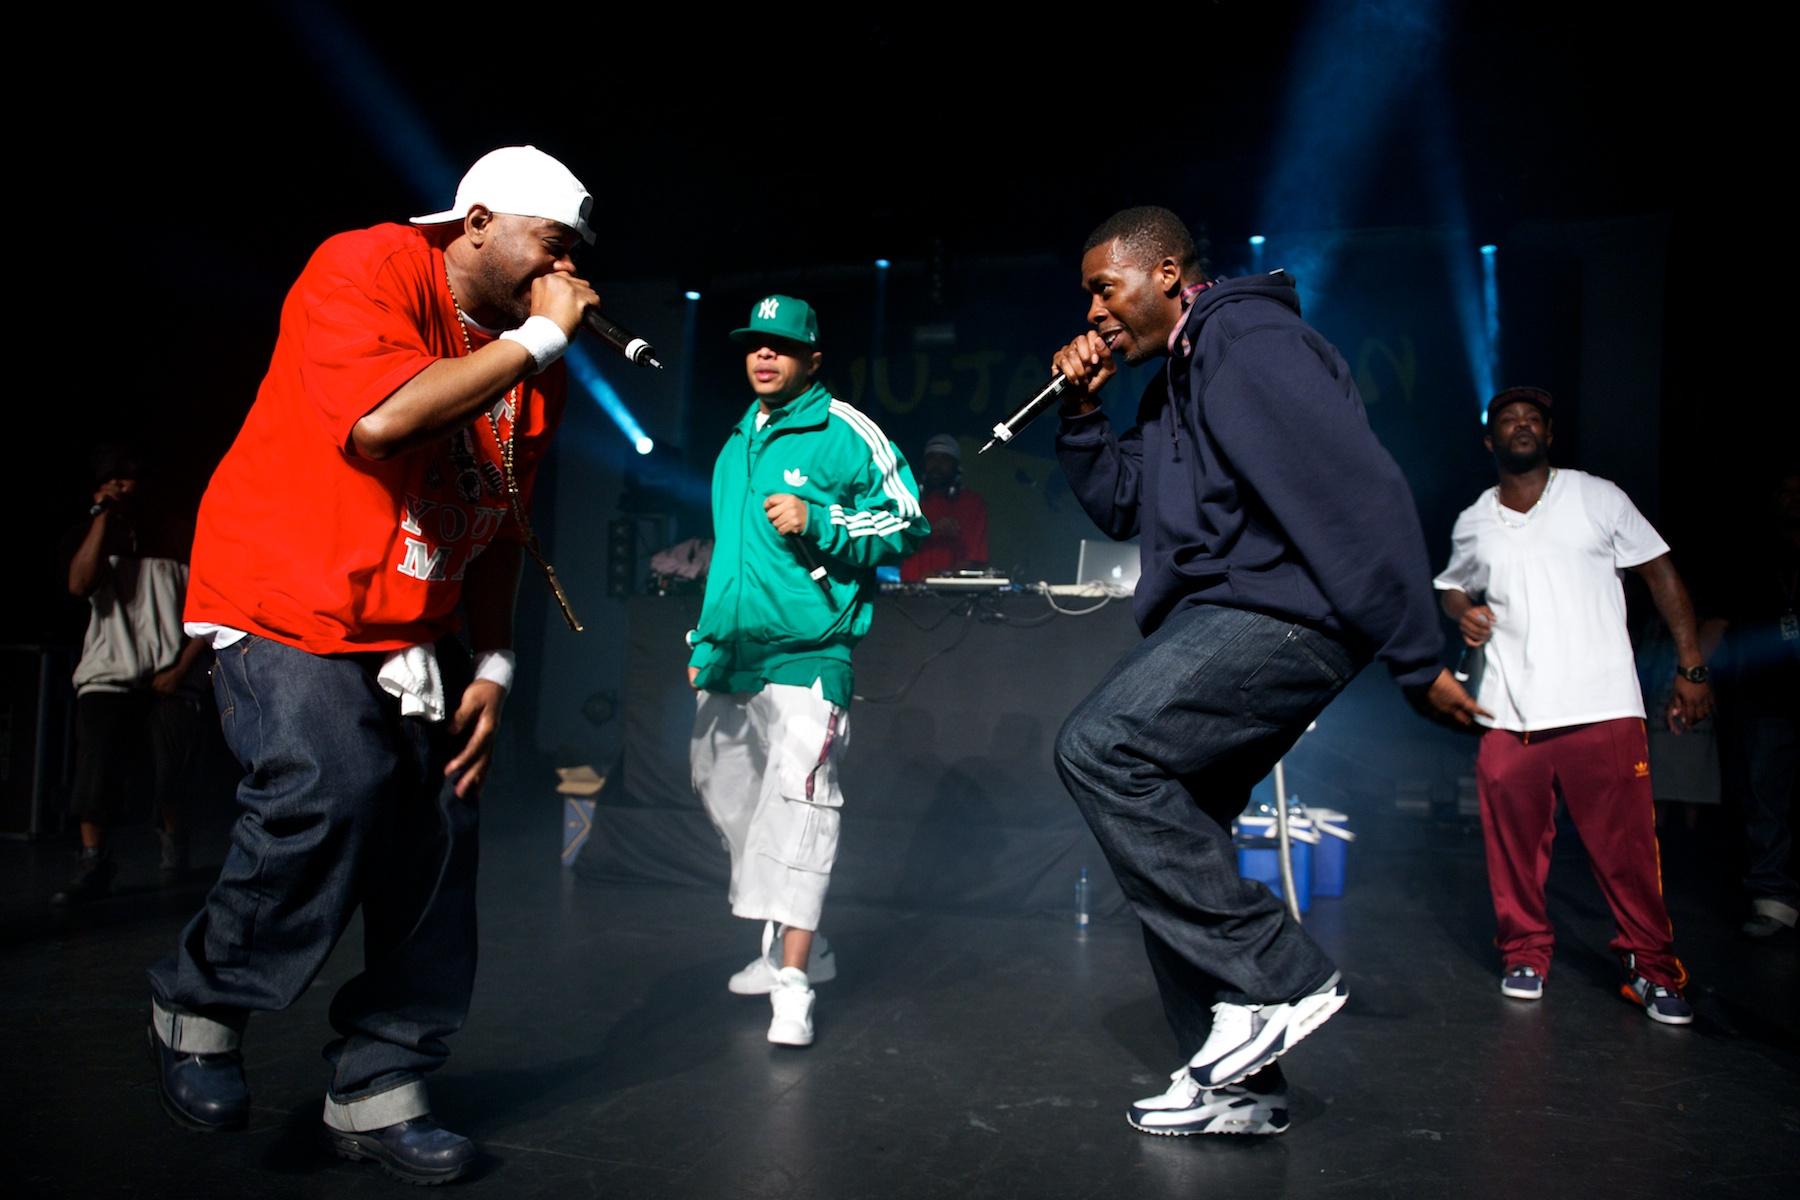 Scarface Full Hd Wallpaper Wu Tang Clan Gangsta Rap Hip Hop Concert Concerts